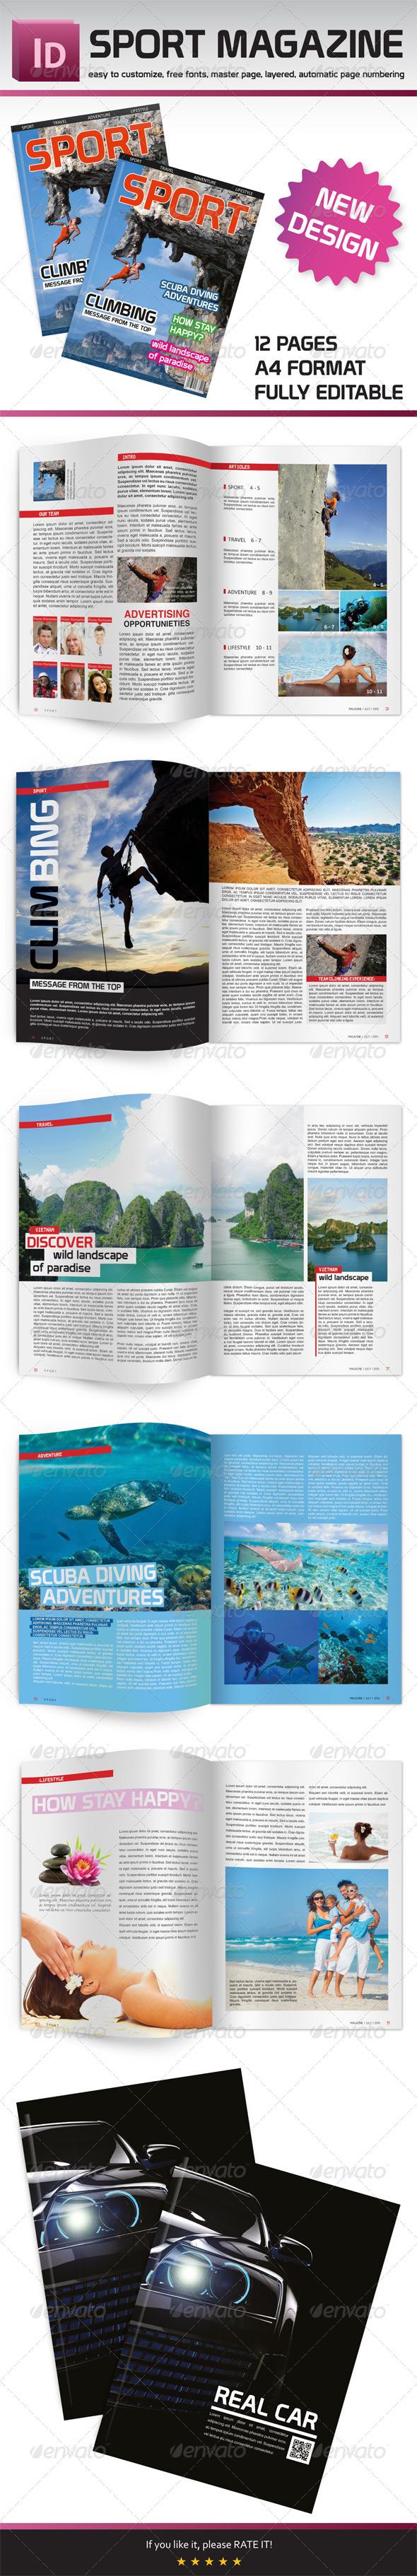 GraphicRiver Sport Magazine 8257753